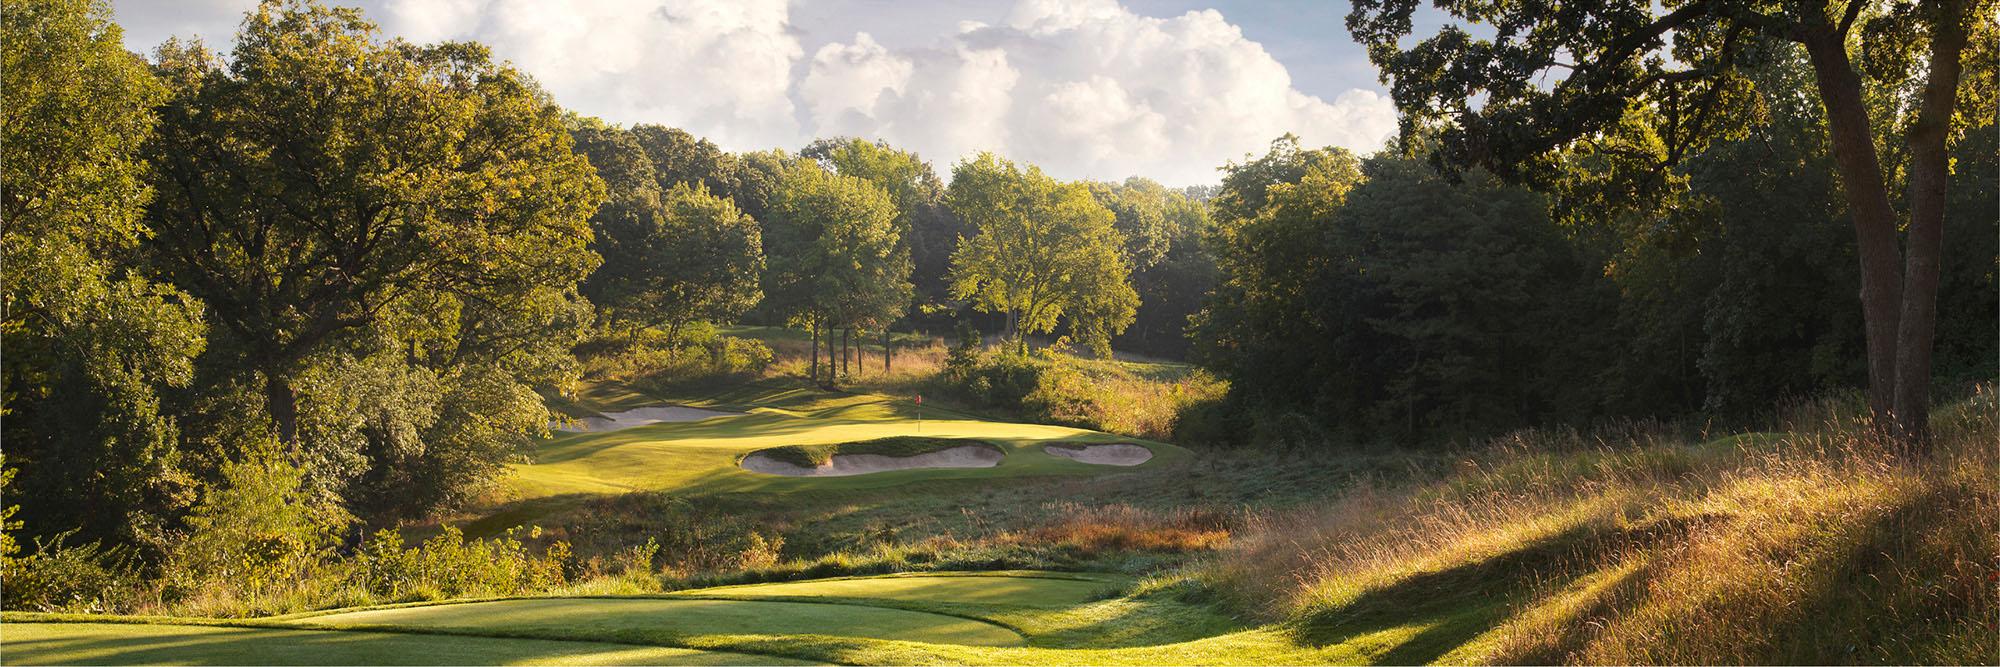 Golf Course Image - Hallbrook No. 6